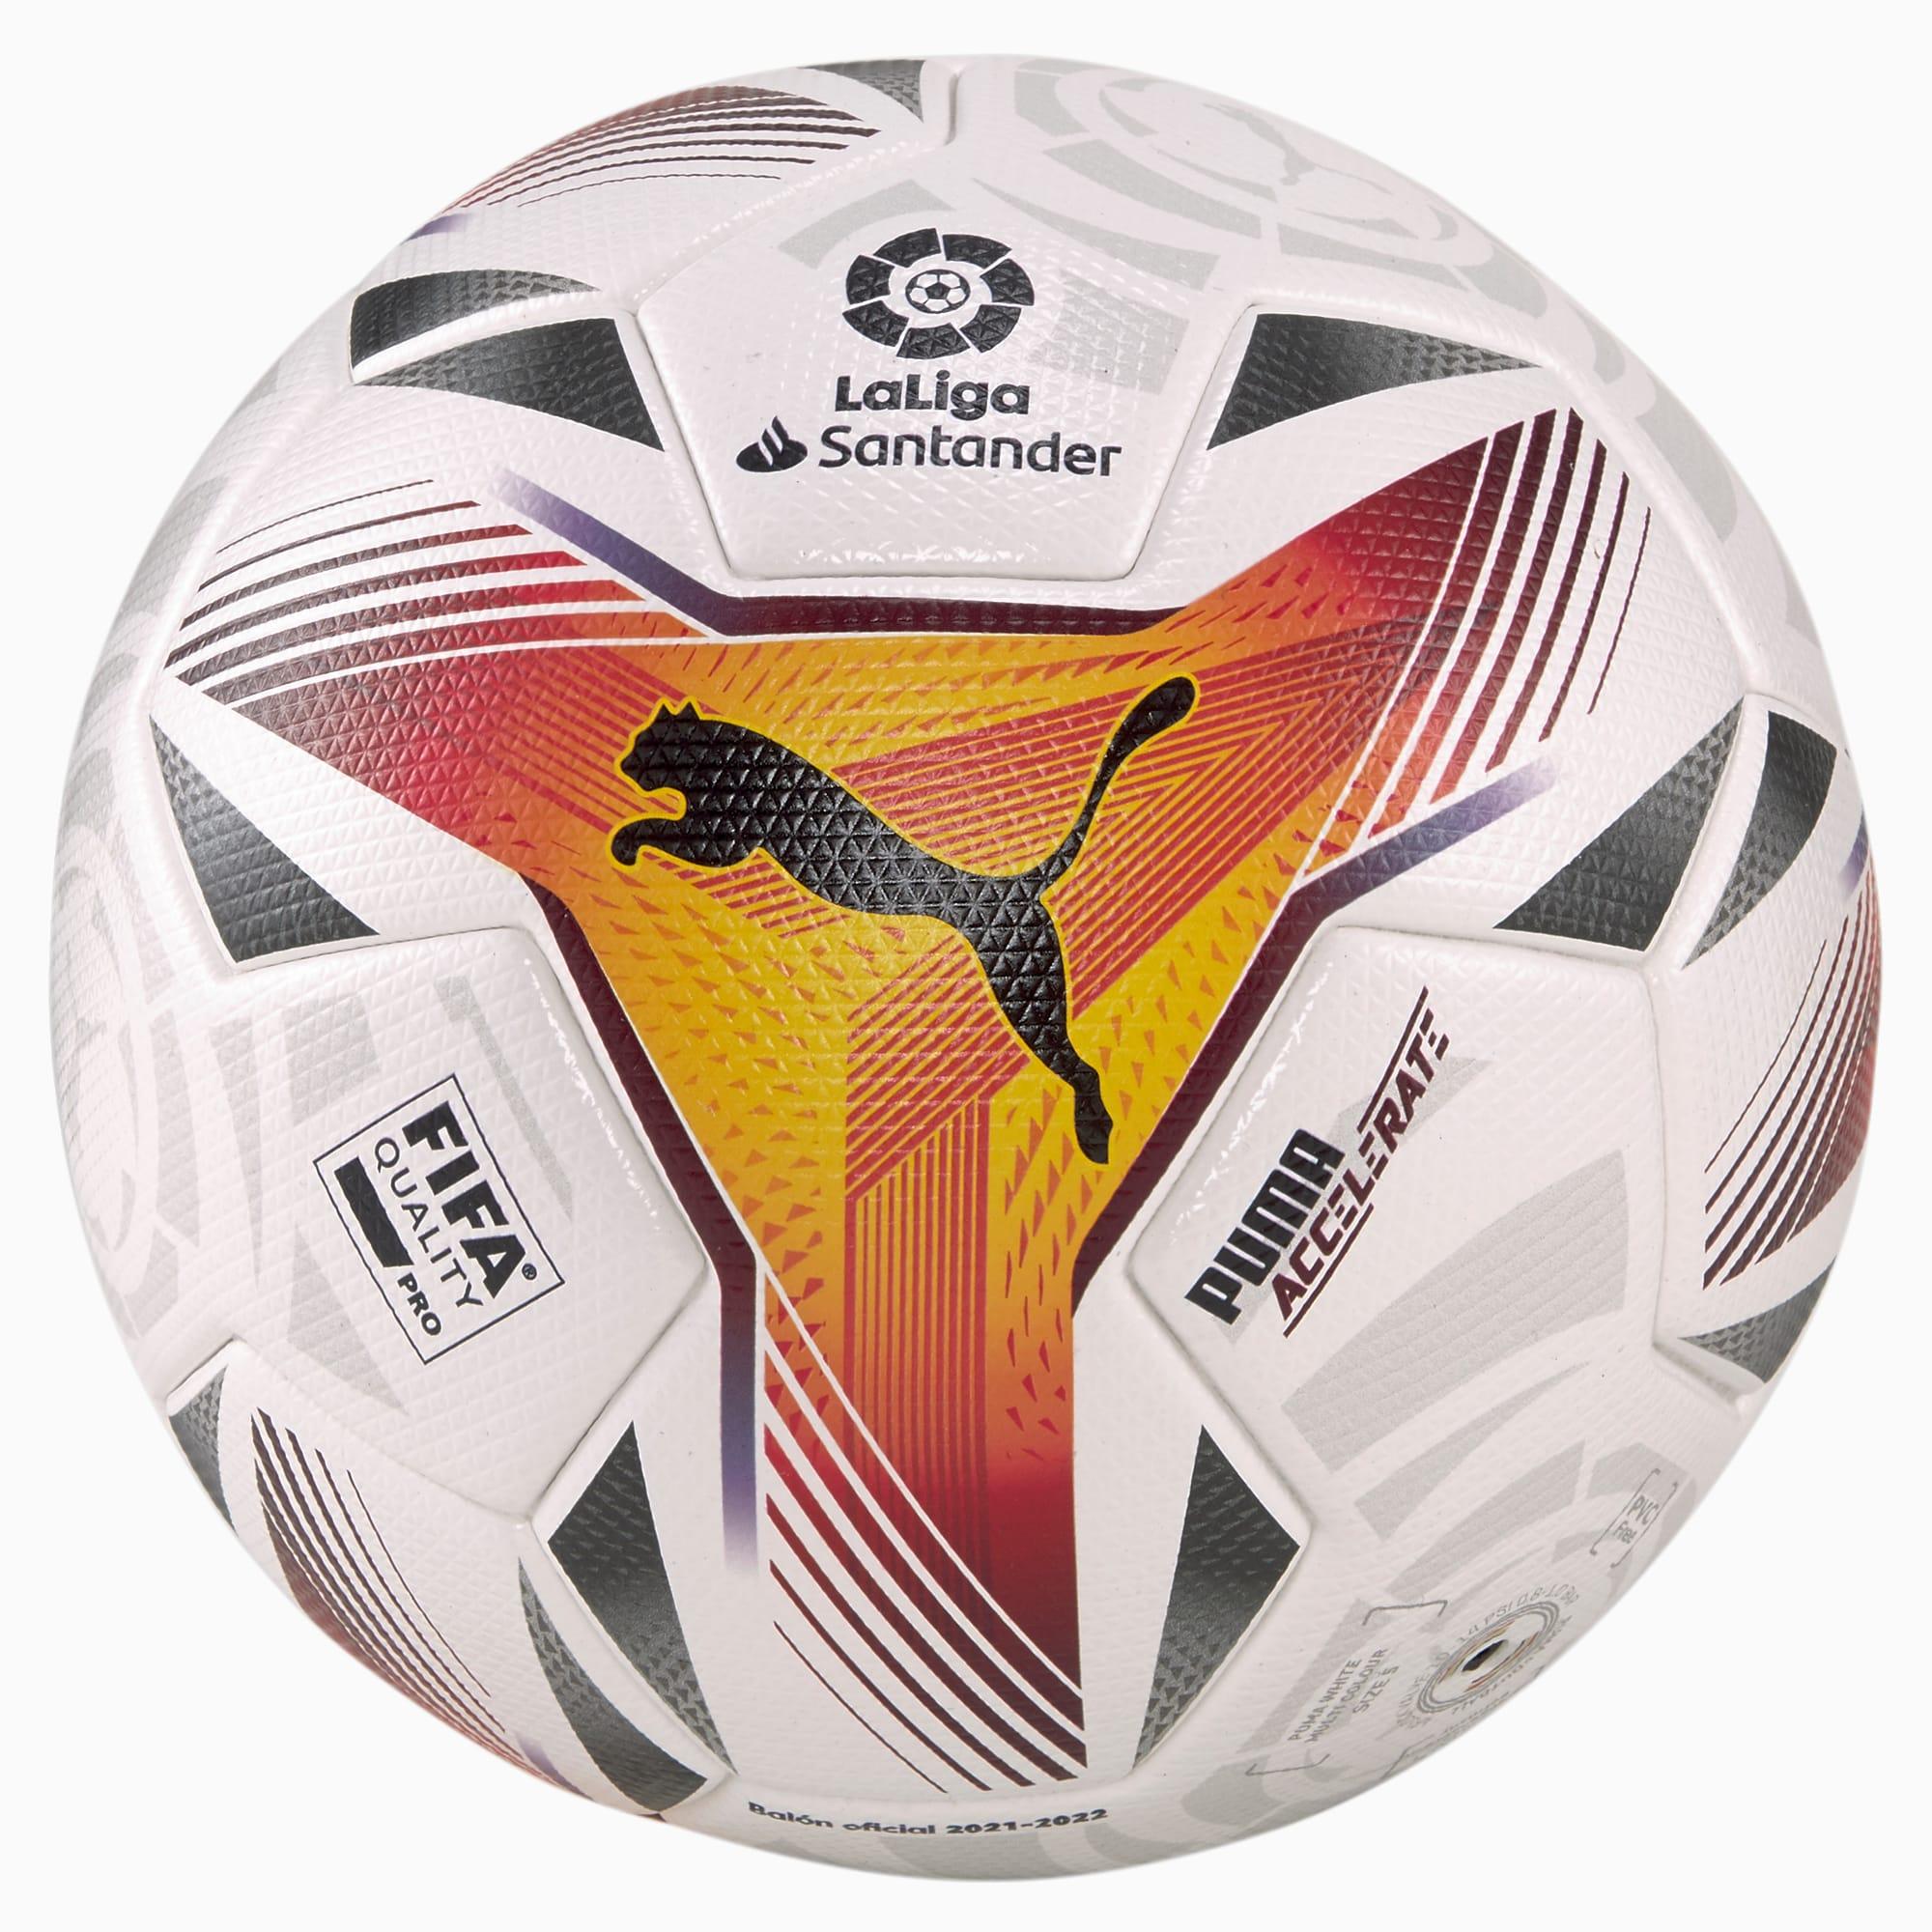 PUMA LA LIGA 1 Accelerate FQP Fußball | Weiß | Größe: 5